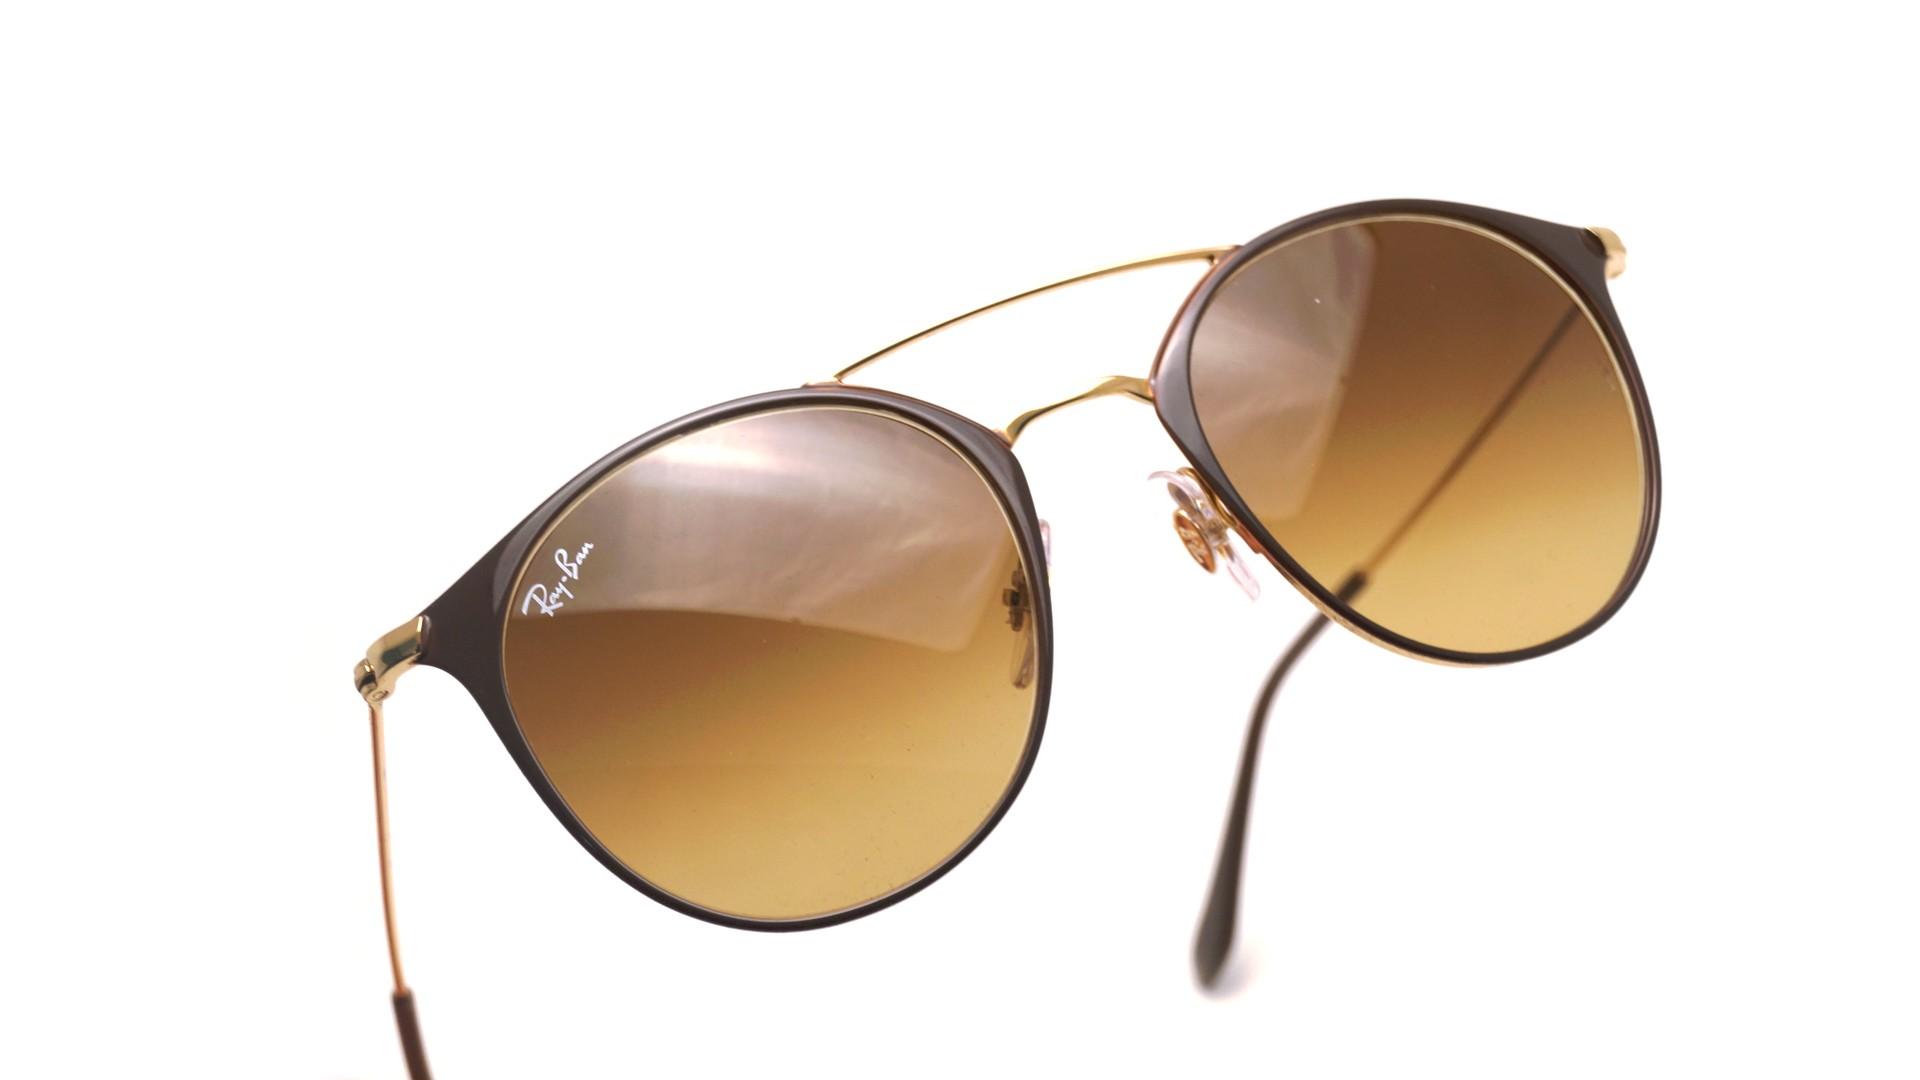 ddba97e70522 Sunglasses Ray-Ban RB3546 9009/85 49-20 Brown Small Gradient